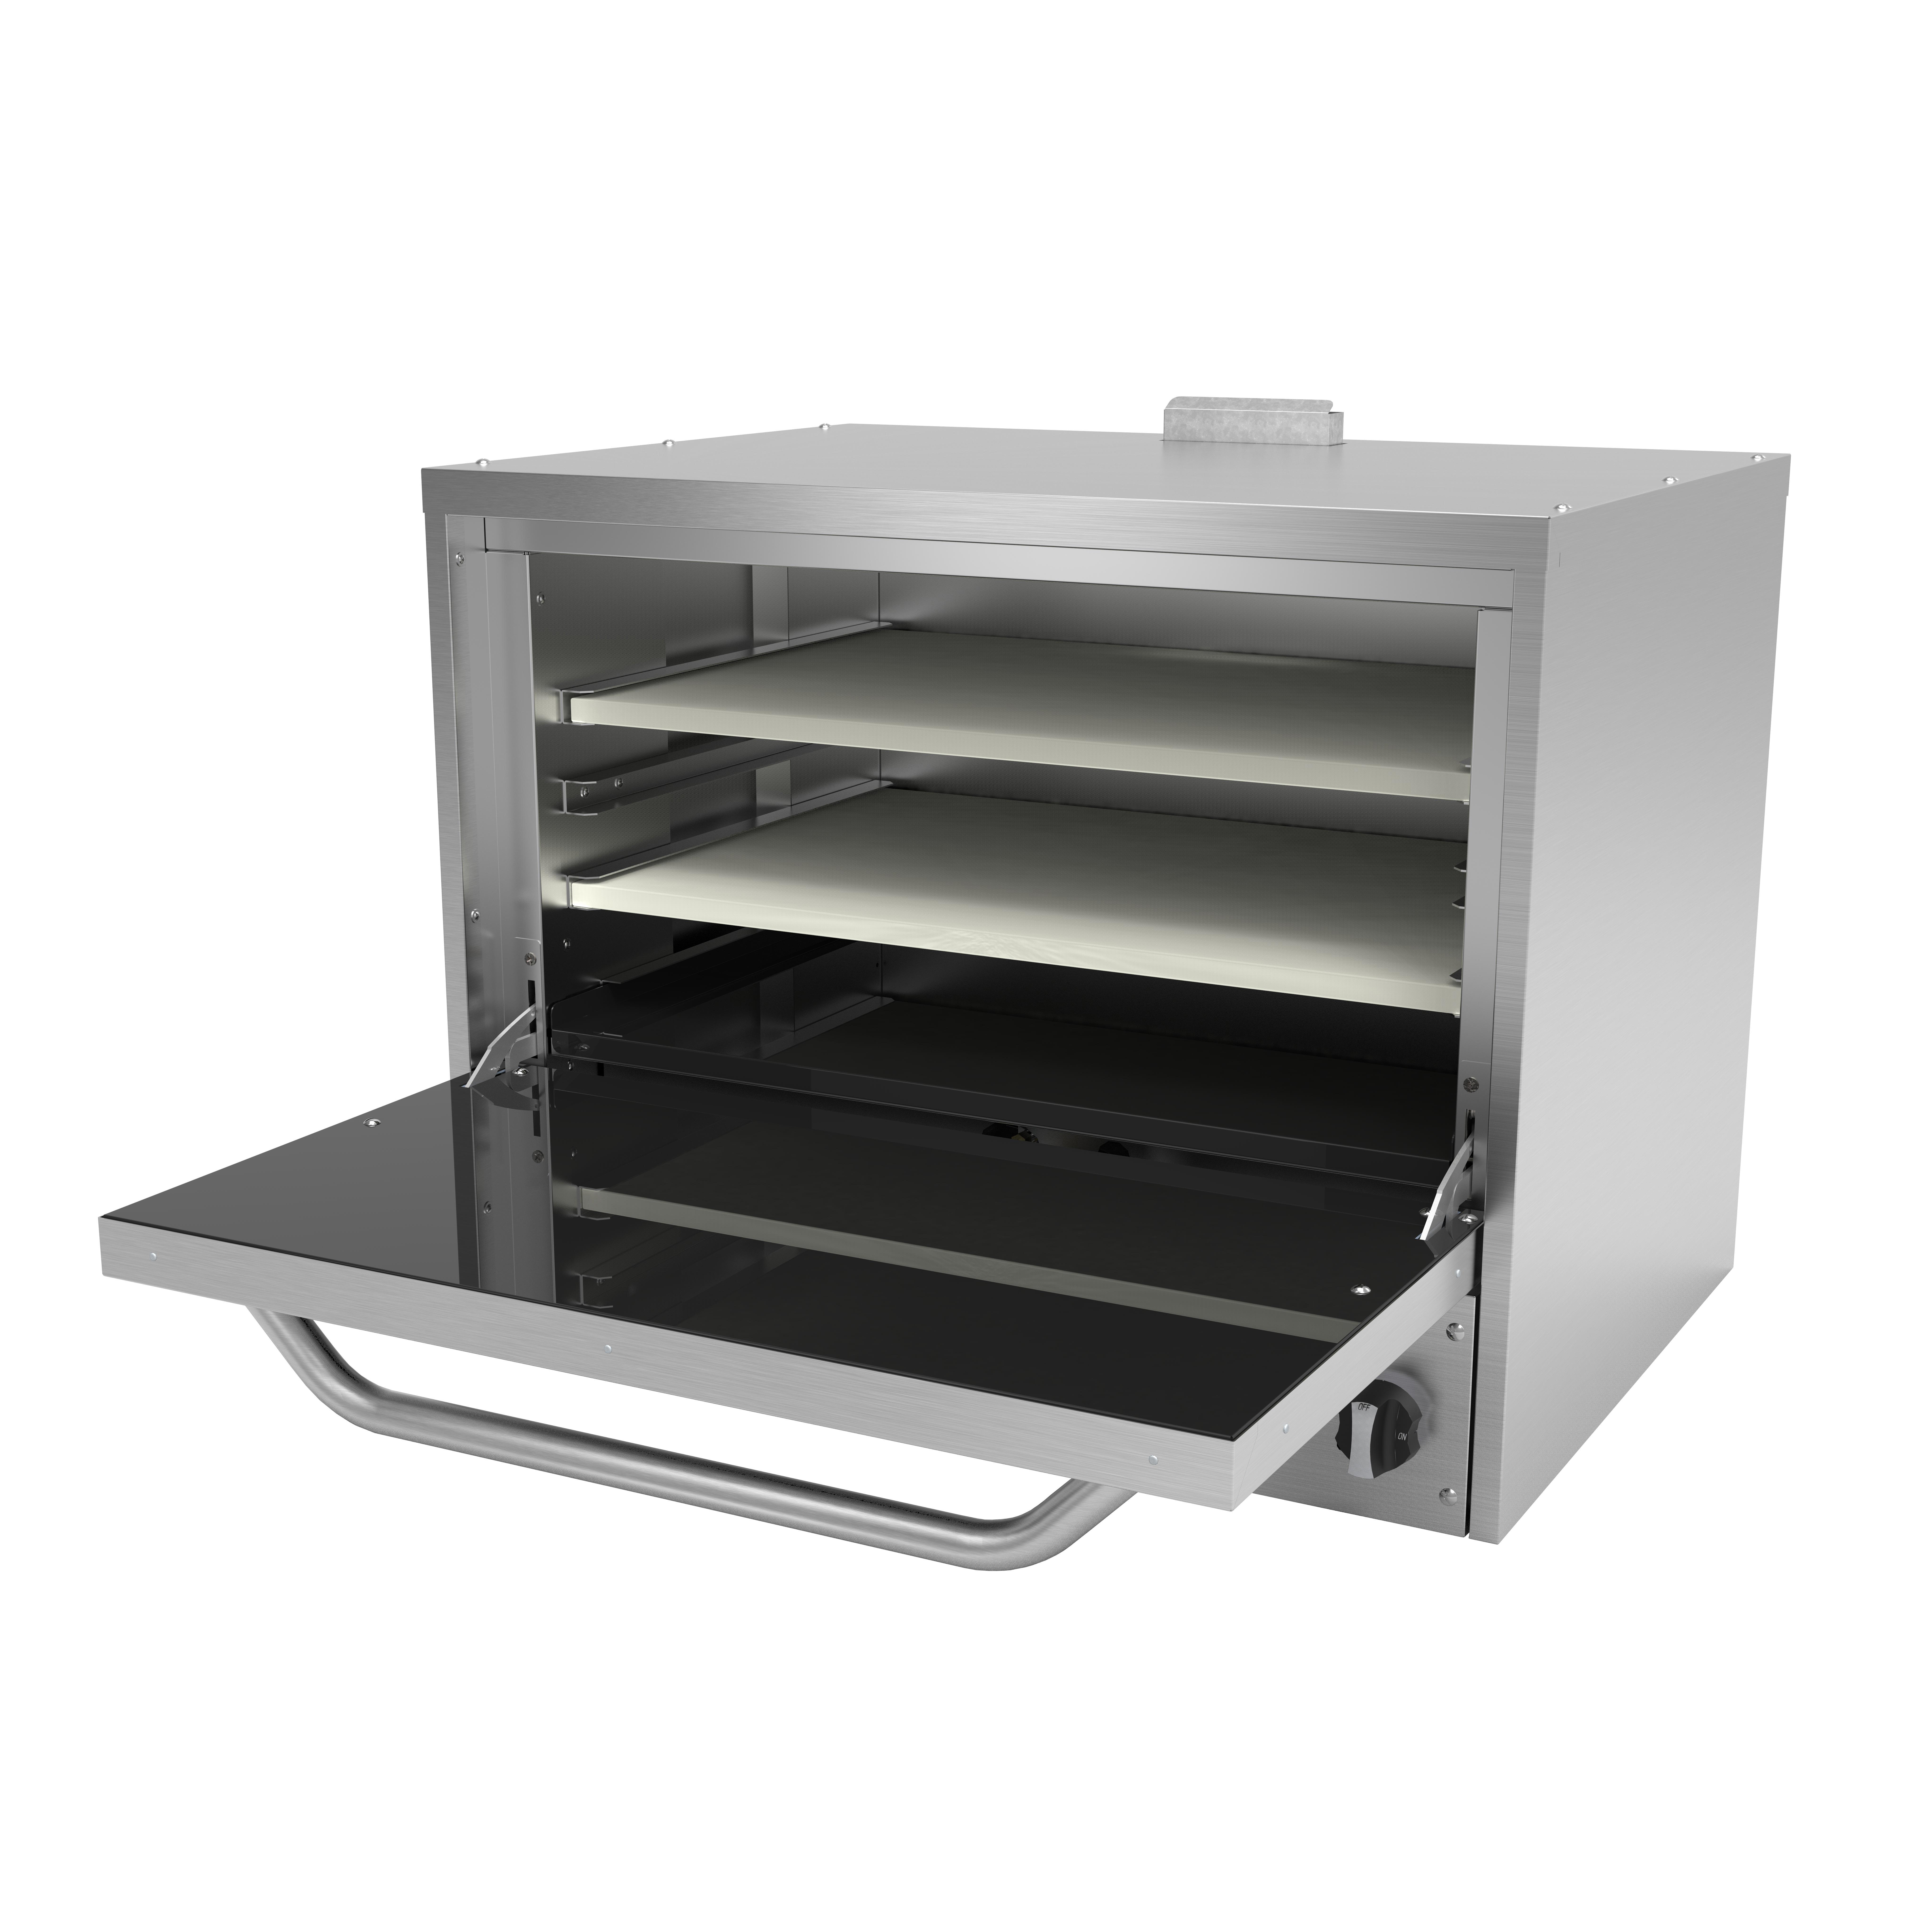 Asber AEPO-24 S pizza bake oven, countertop, gas